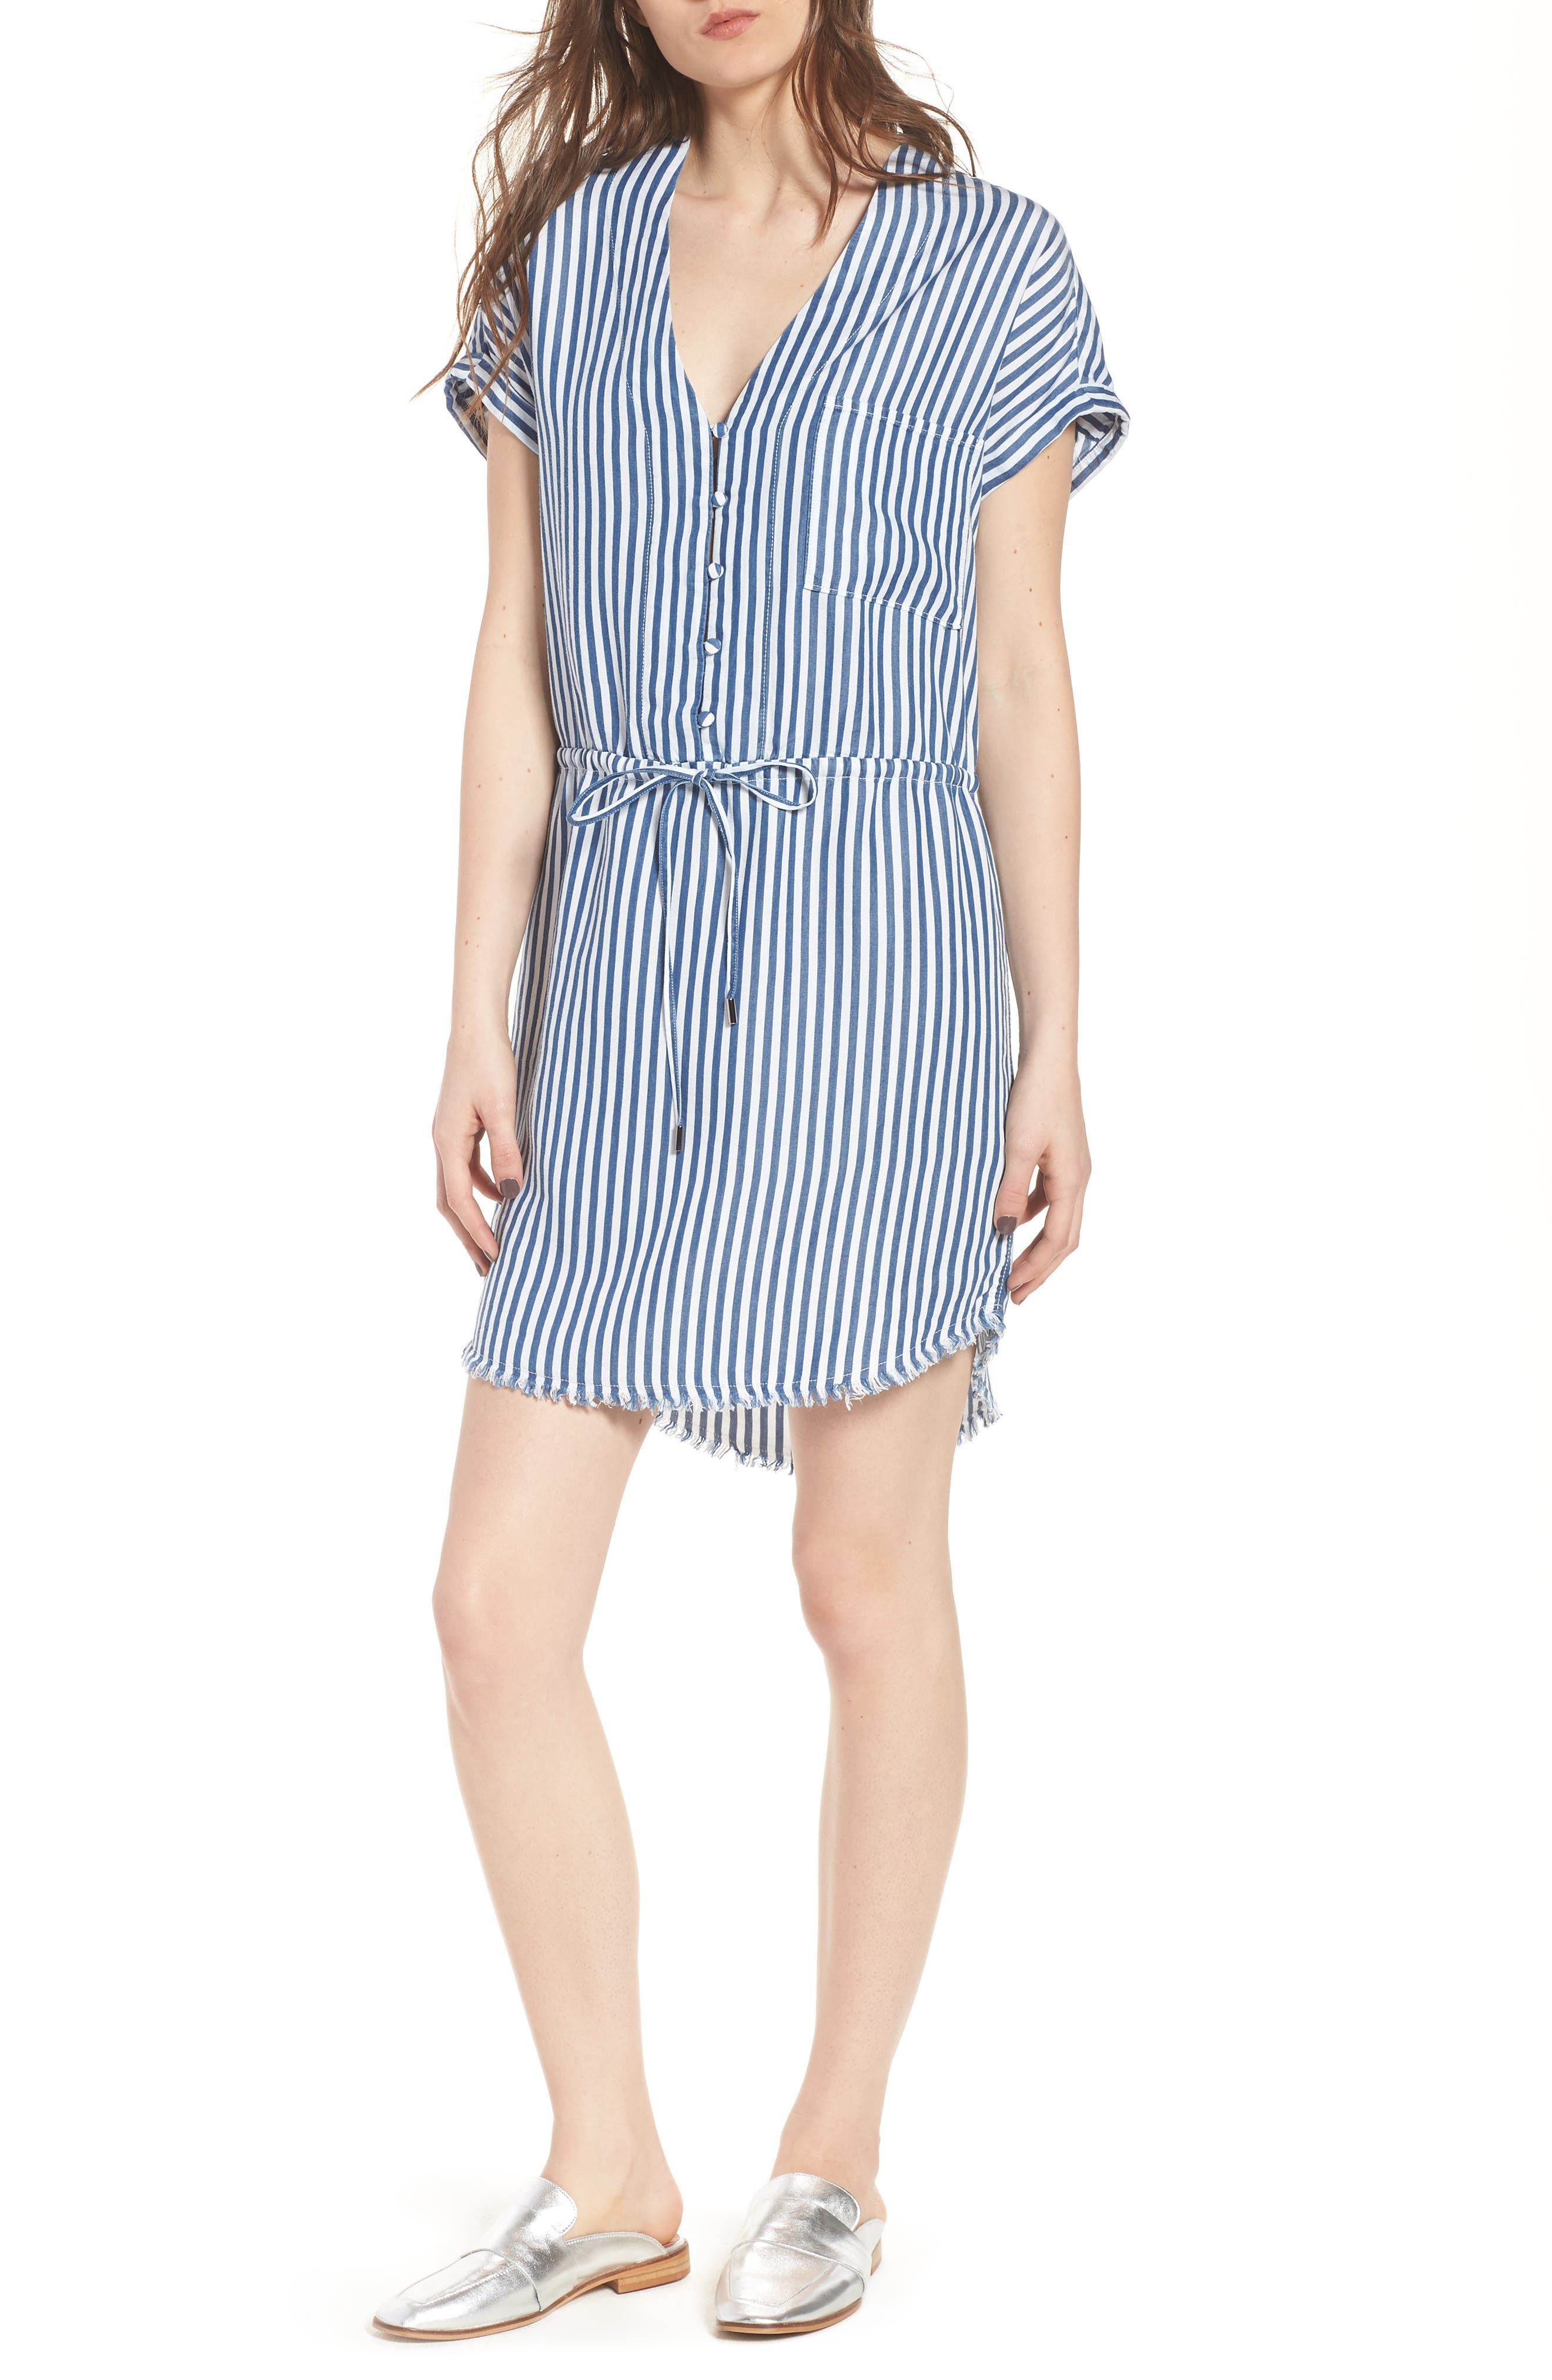 Haidee Stripe Shift Dress,                         Main,                         color, WHITE/ BLUE BELL STRIPE